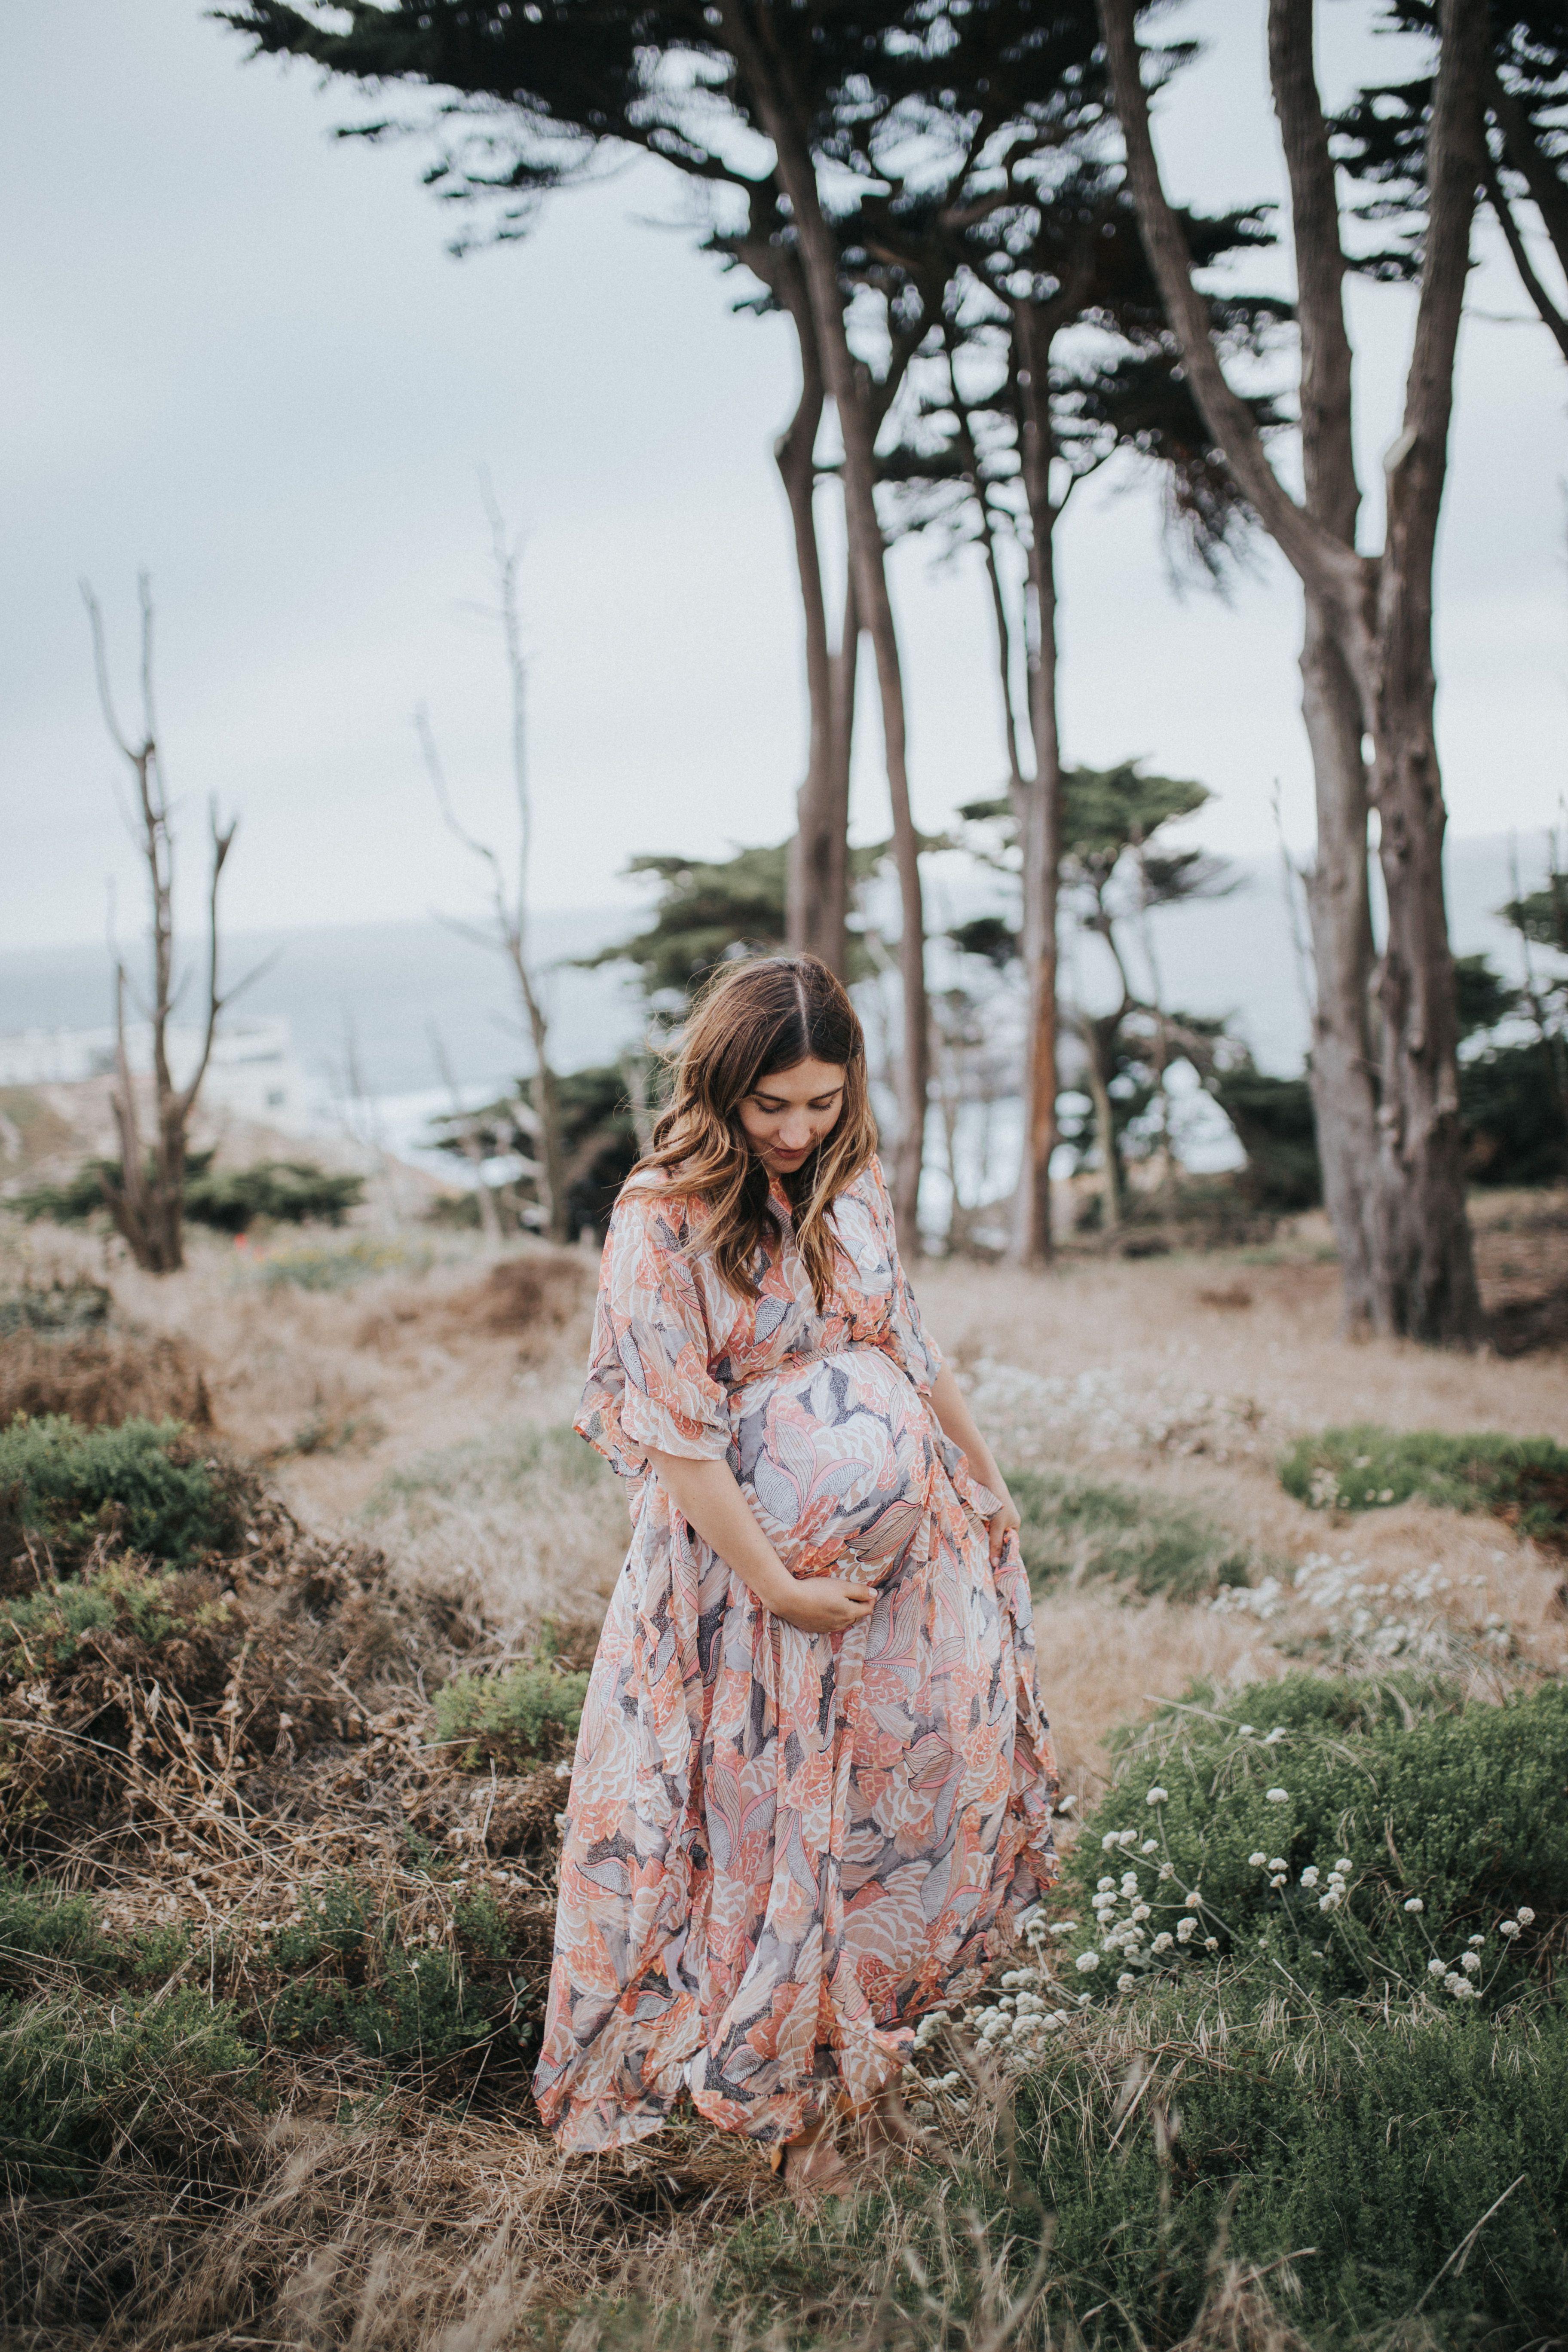 8616c2146376b Sutro Baths Lands end San Francisco Bay area Maternity portrait photography